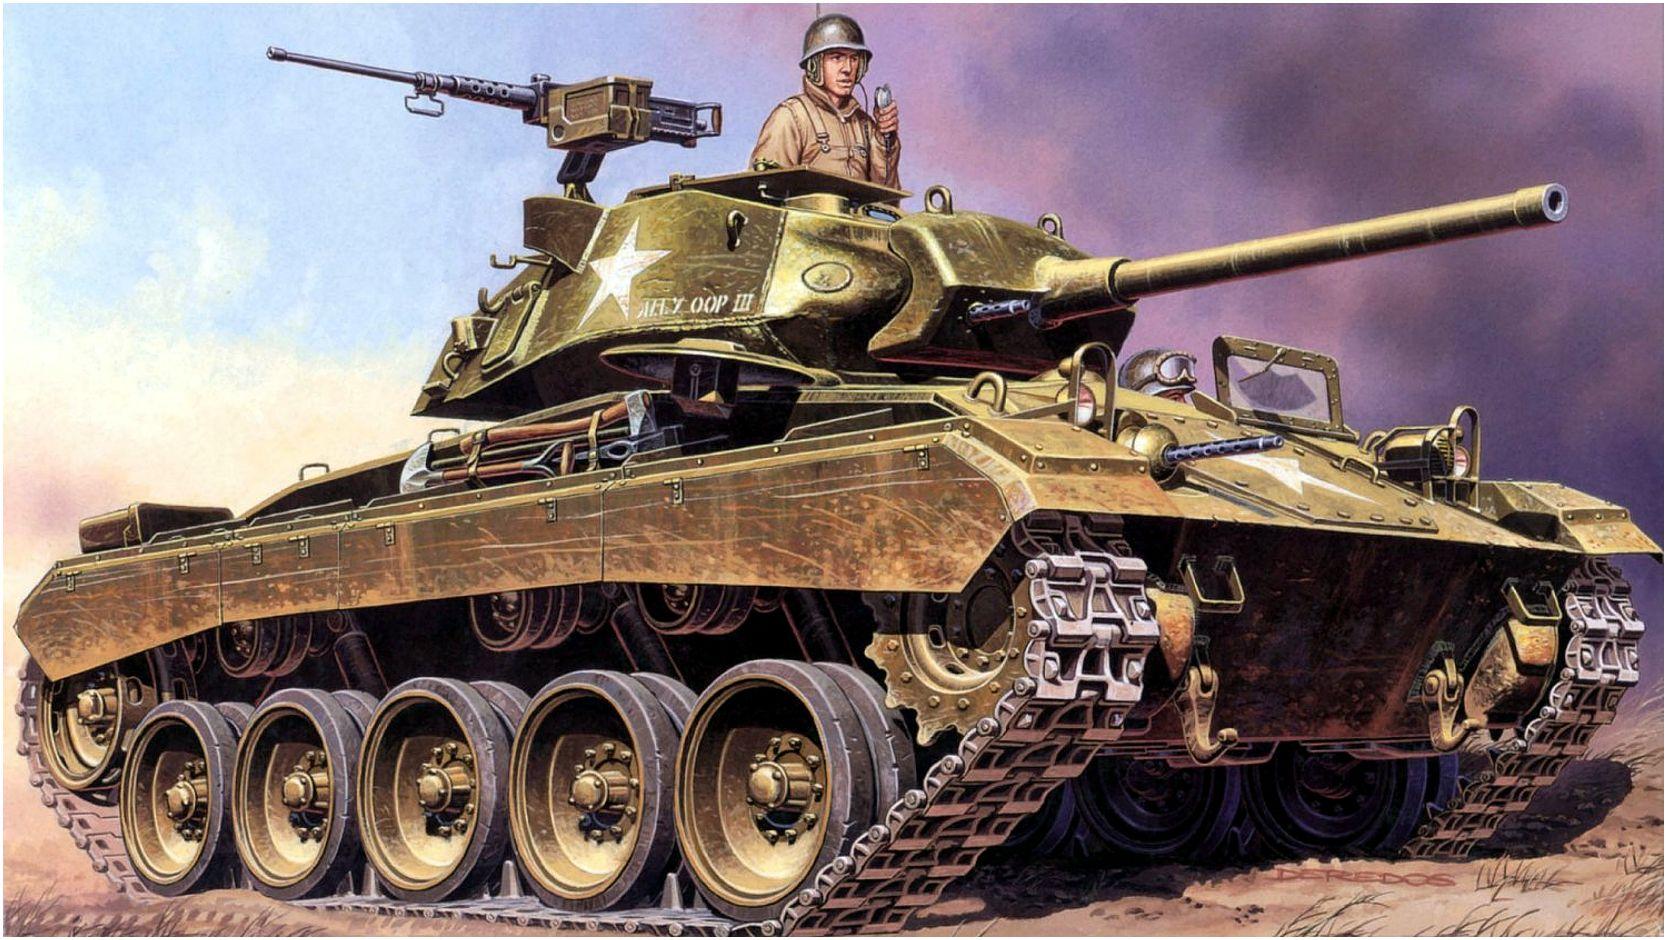 Deredos Andrzej. Танк M-24 Chaffee.